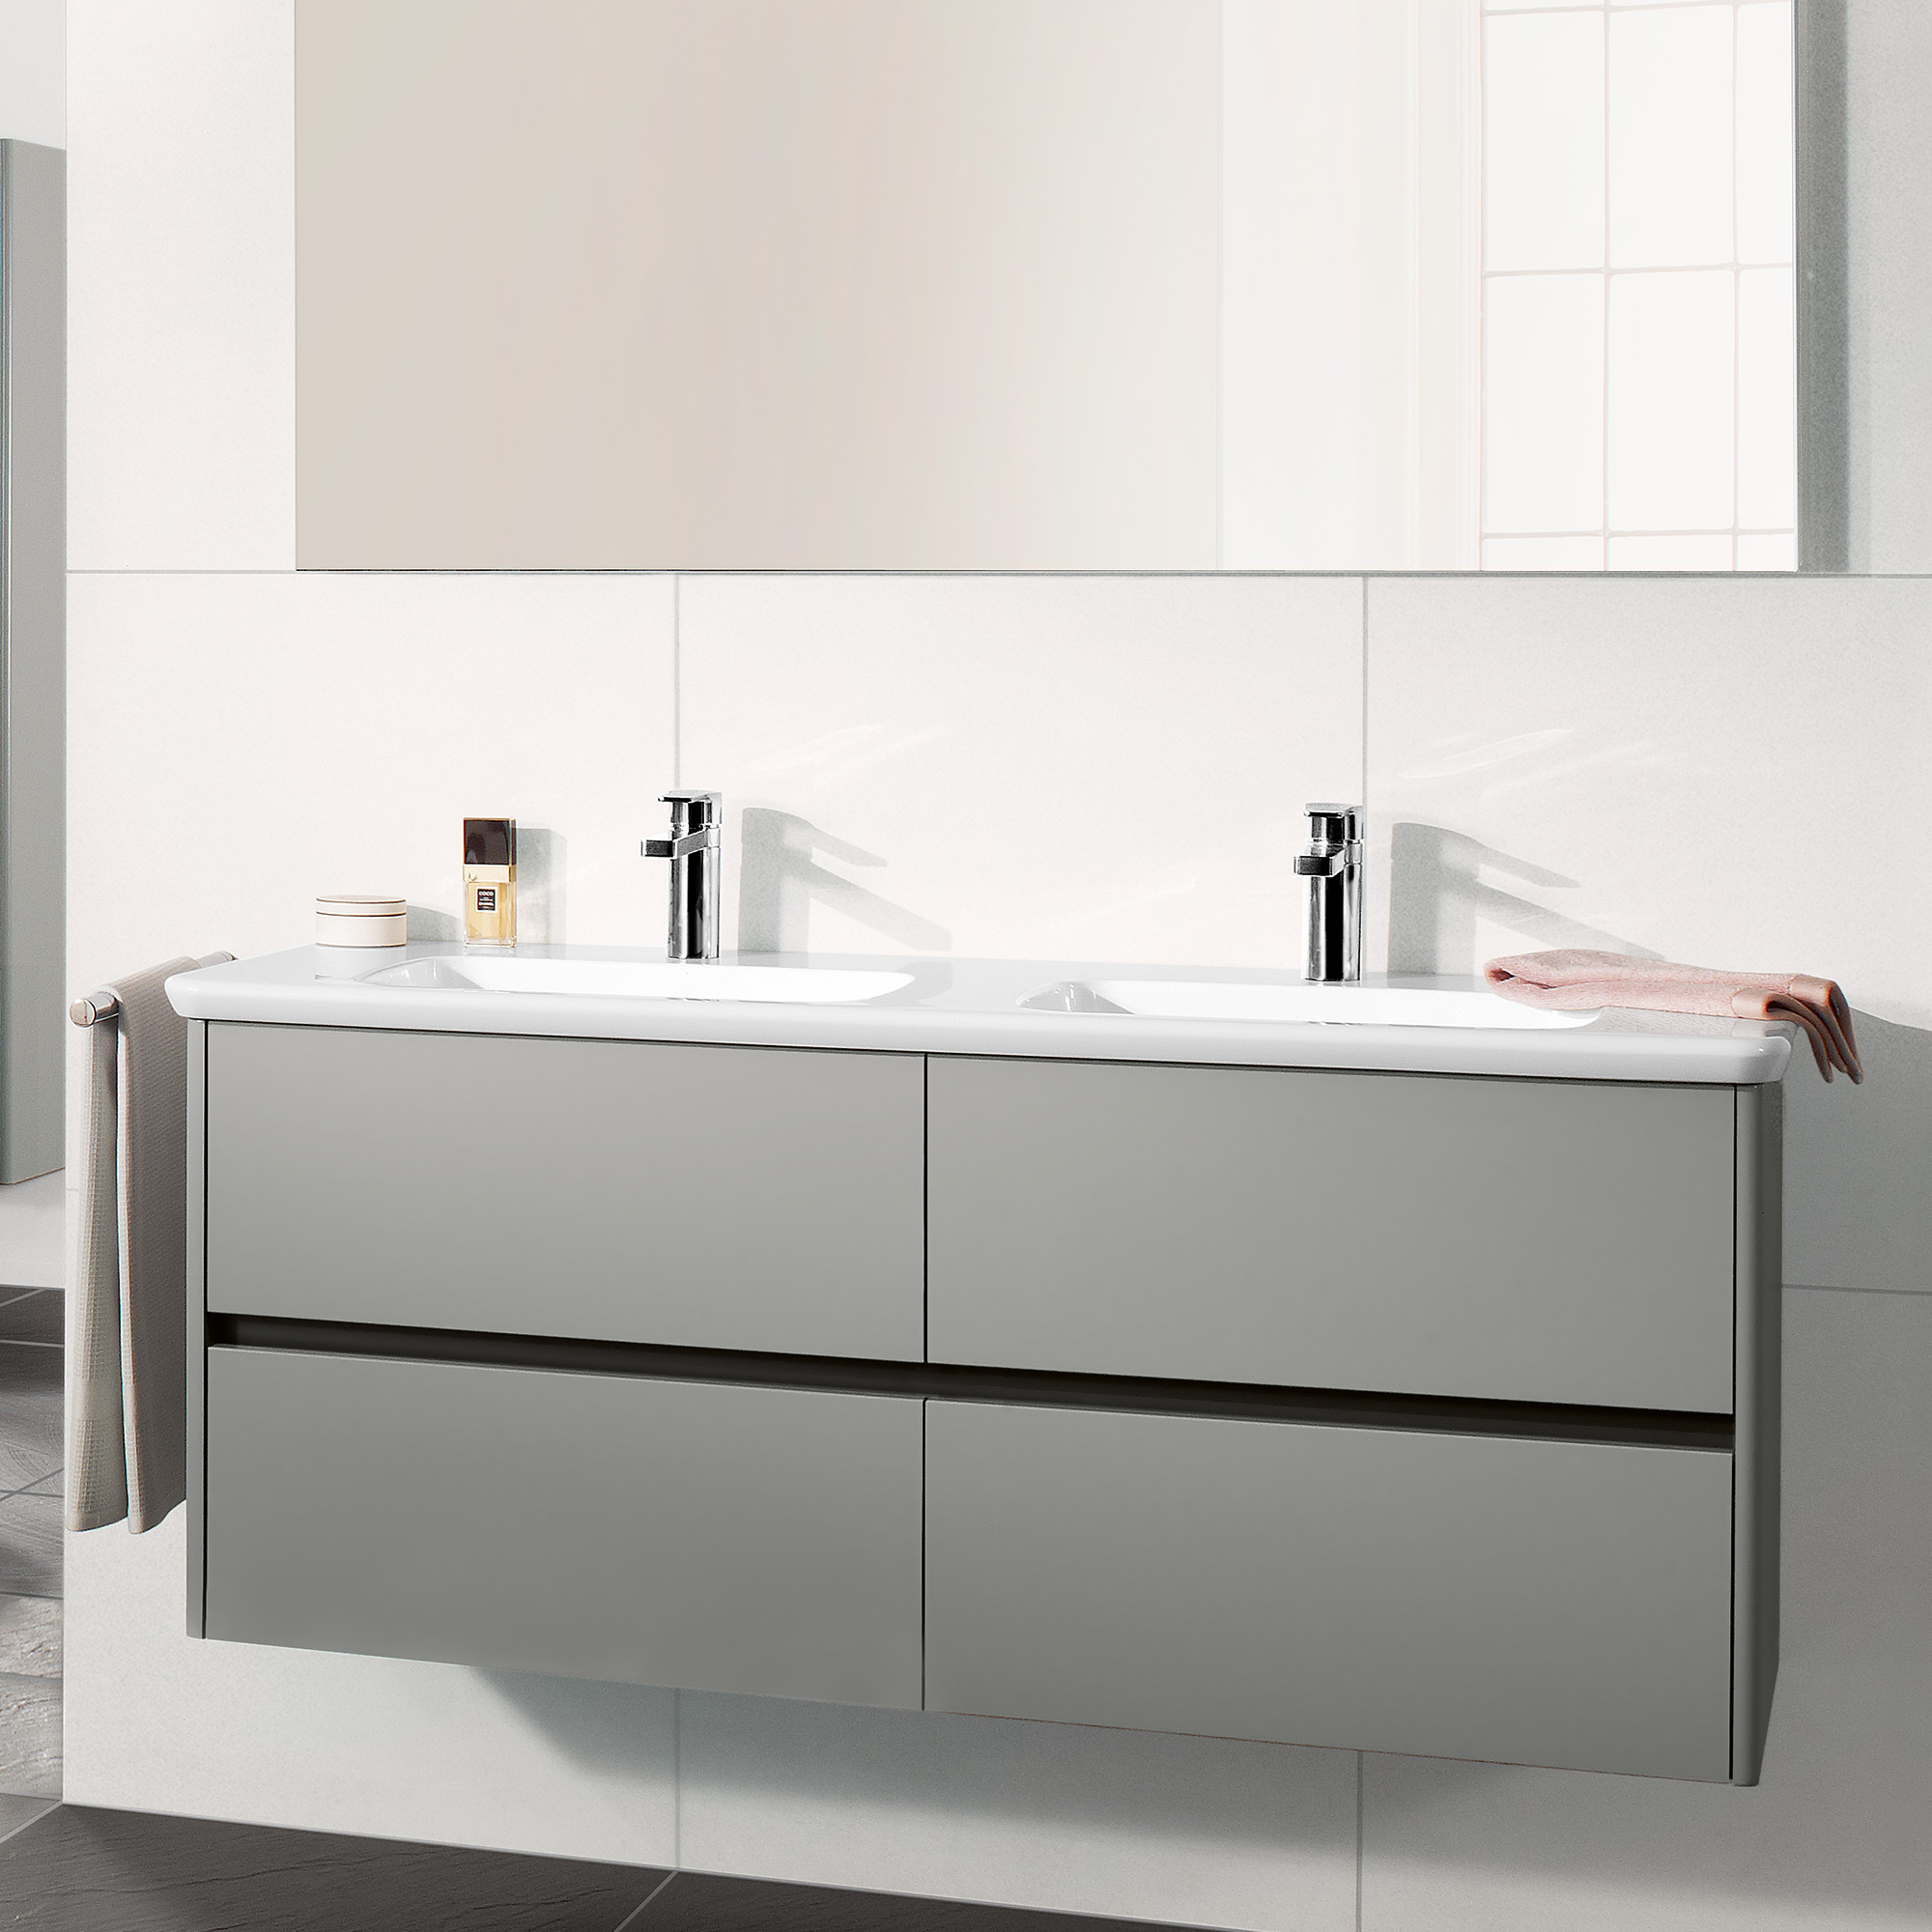 villeroy boch vivia doppelwaschtisch b 130 t 49 cm wei 4143d101 reuter onlineshop. Black Bedroom Furniture Sets. Home Design Ideas